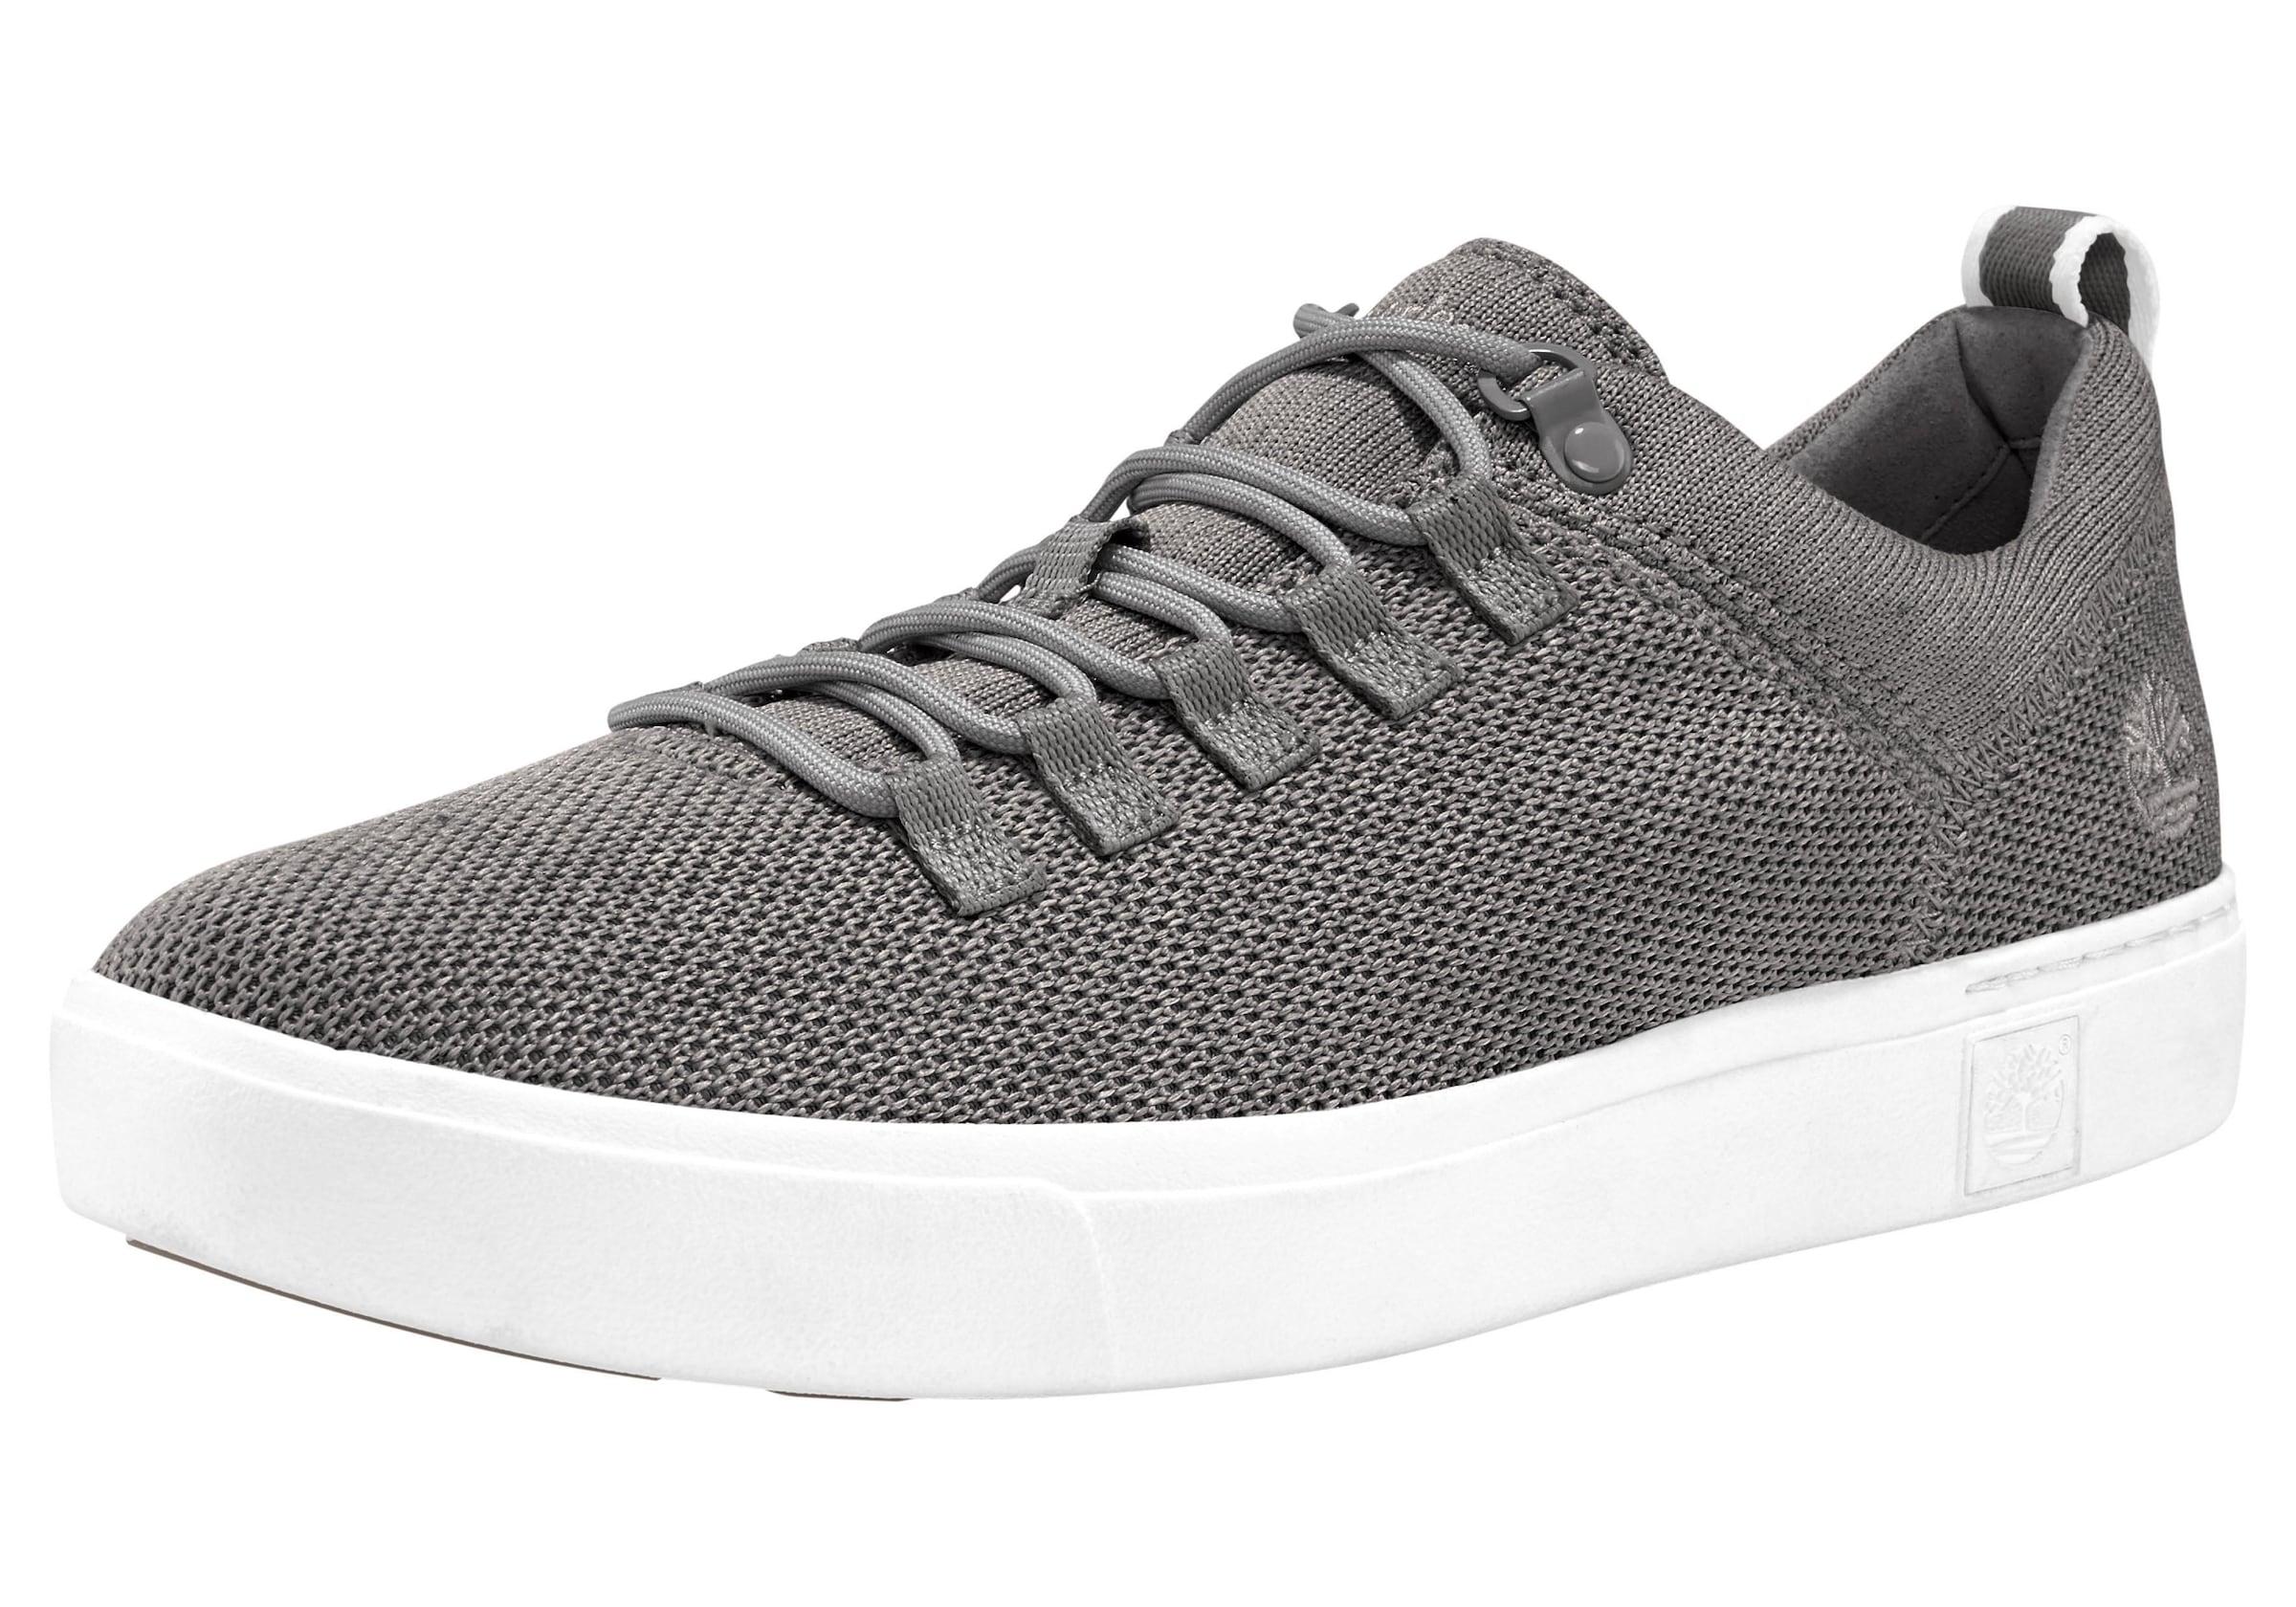 Timberland Amherst Flexi Knit Oxford Sneaker Castlerock   9 (US)